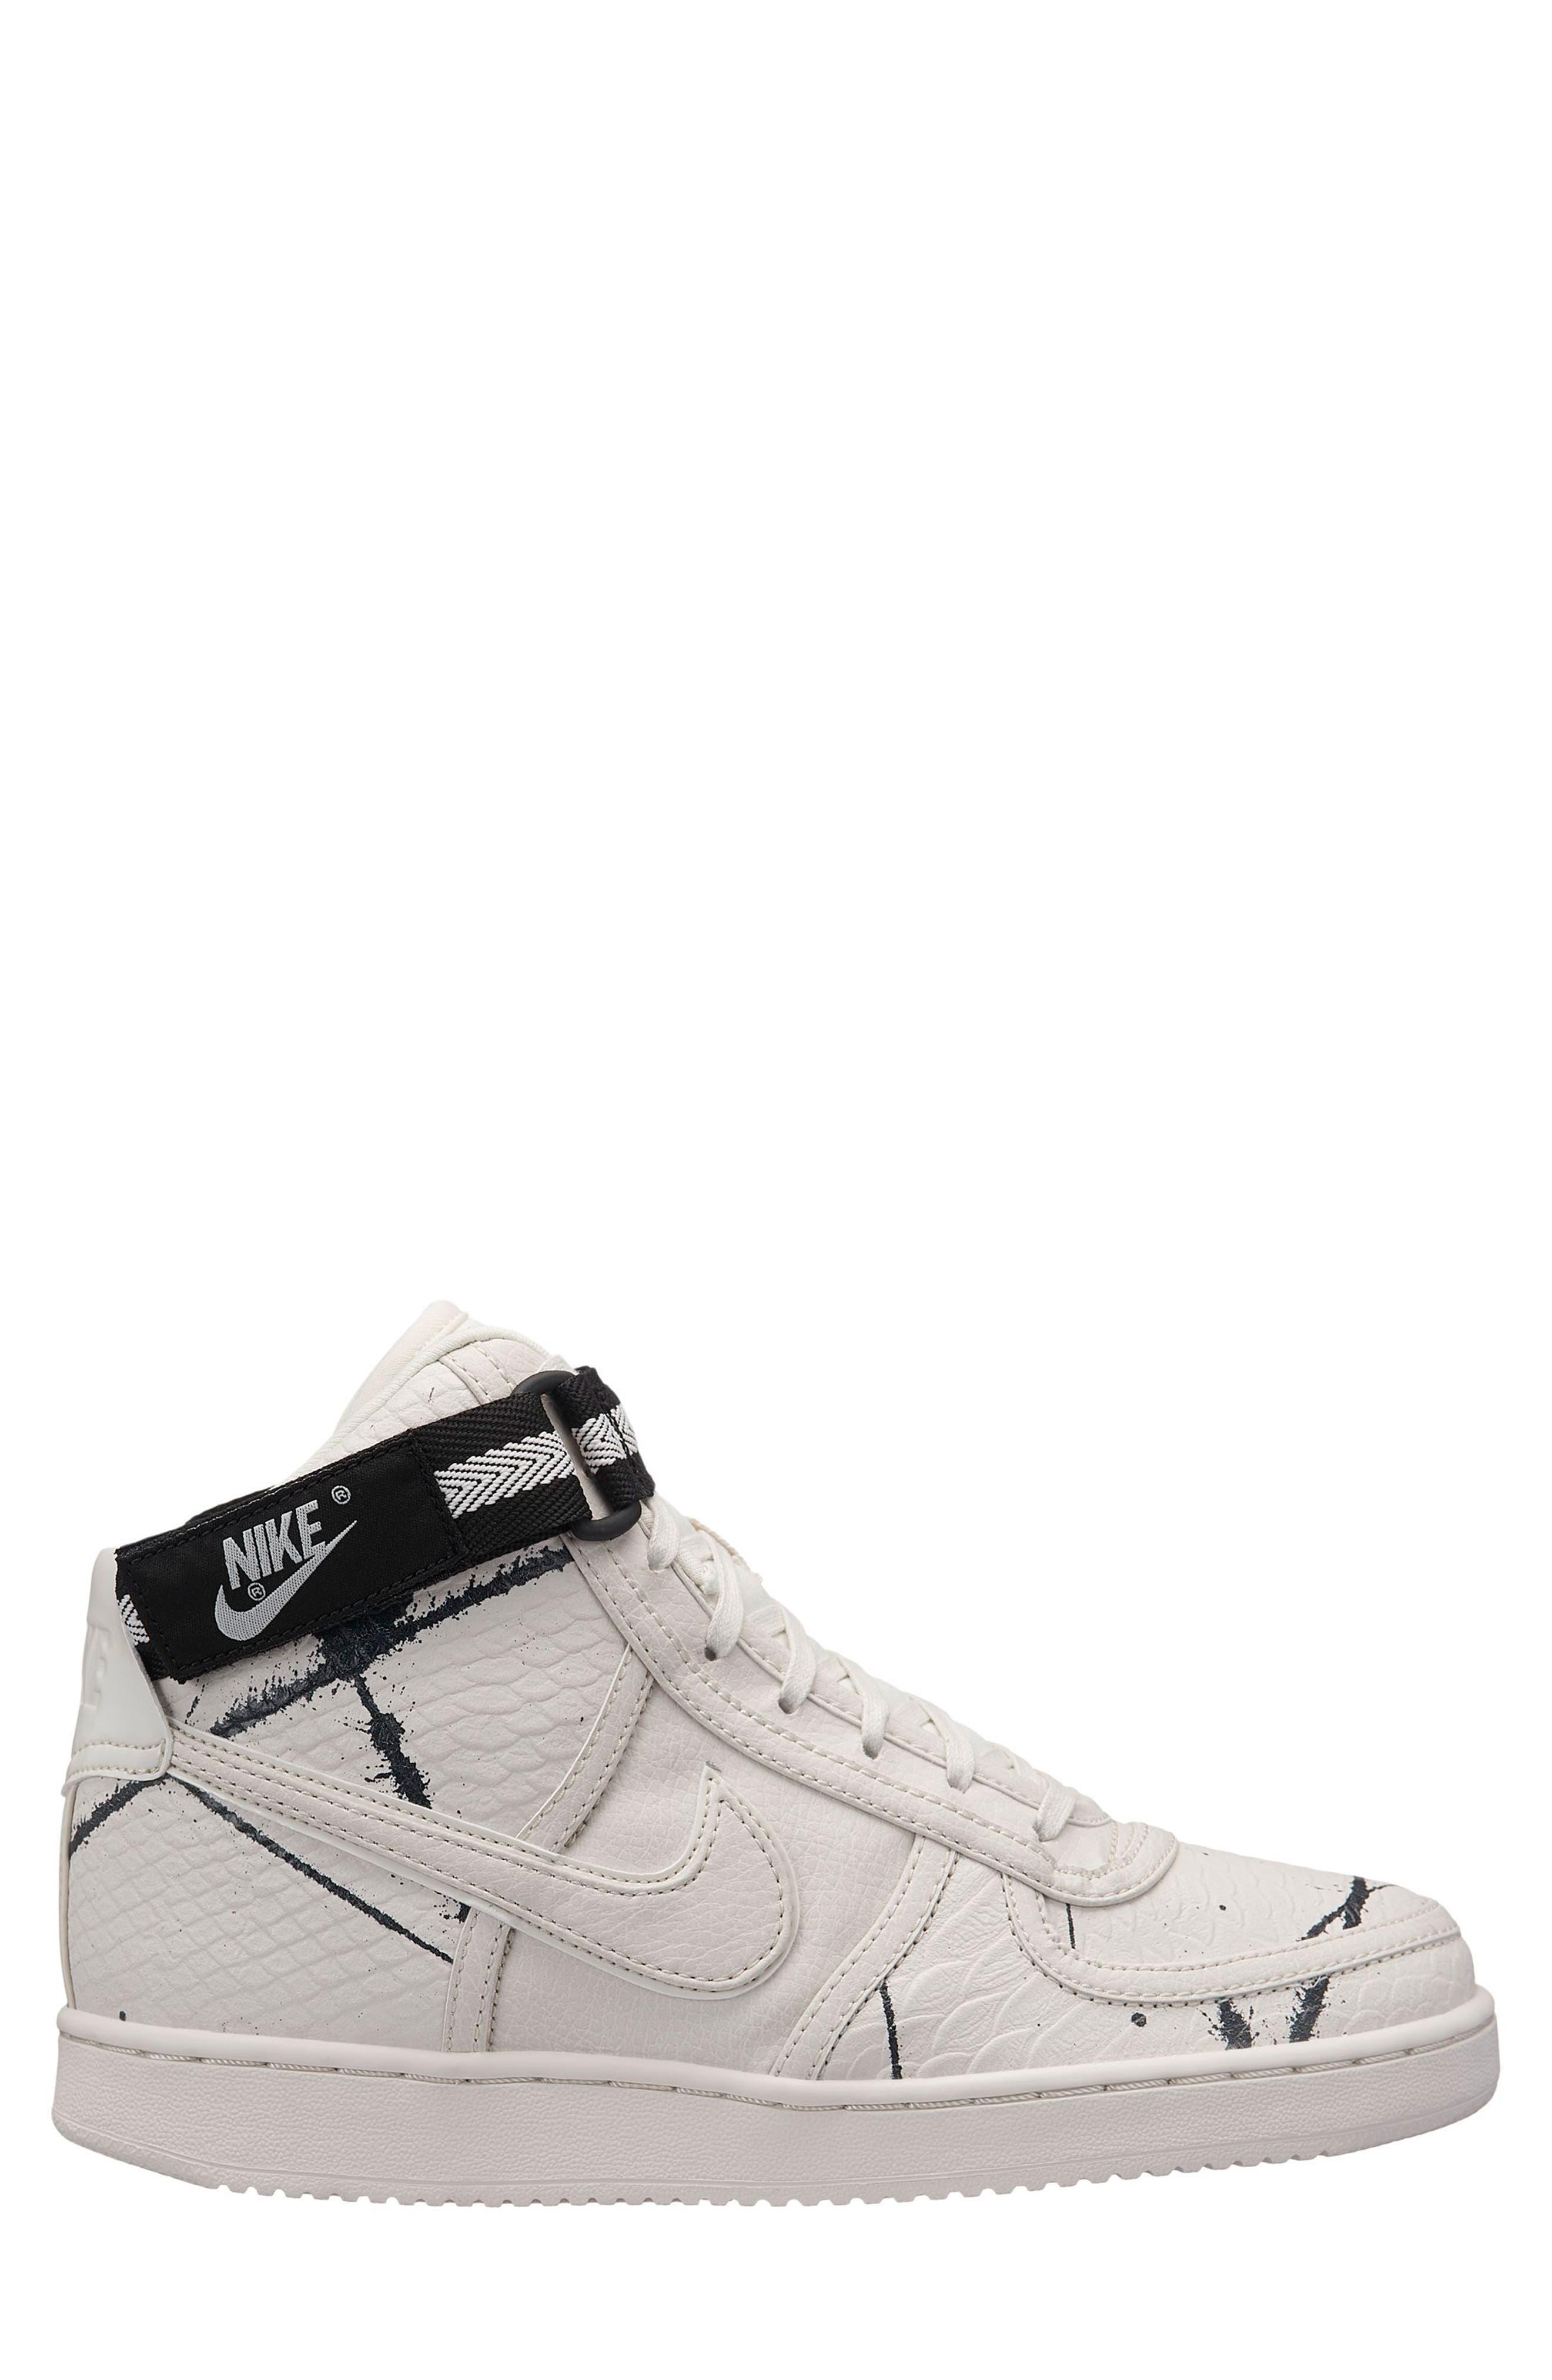 Main Image - Nike Vandal High Lux Sneaker (Women)